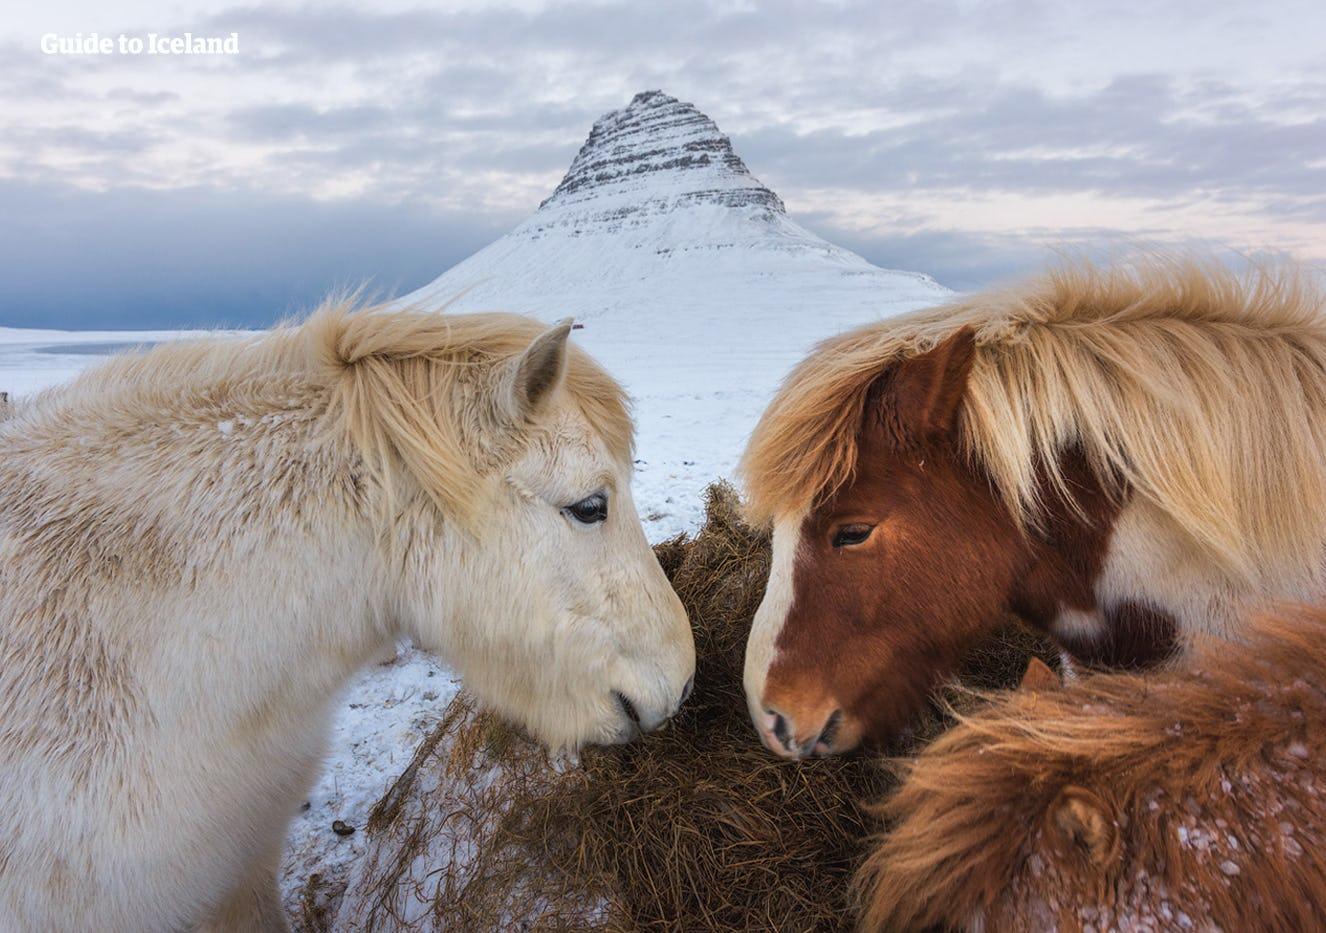 Icelandic horses and the iconic Kirkjufell mountain on the Snæfellsnes Peninsula.